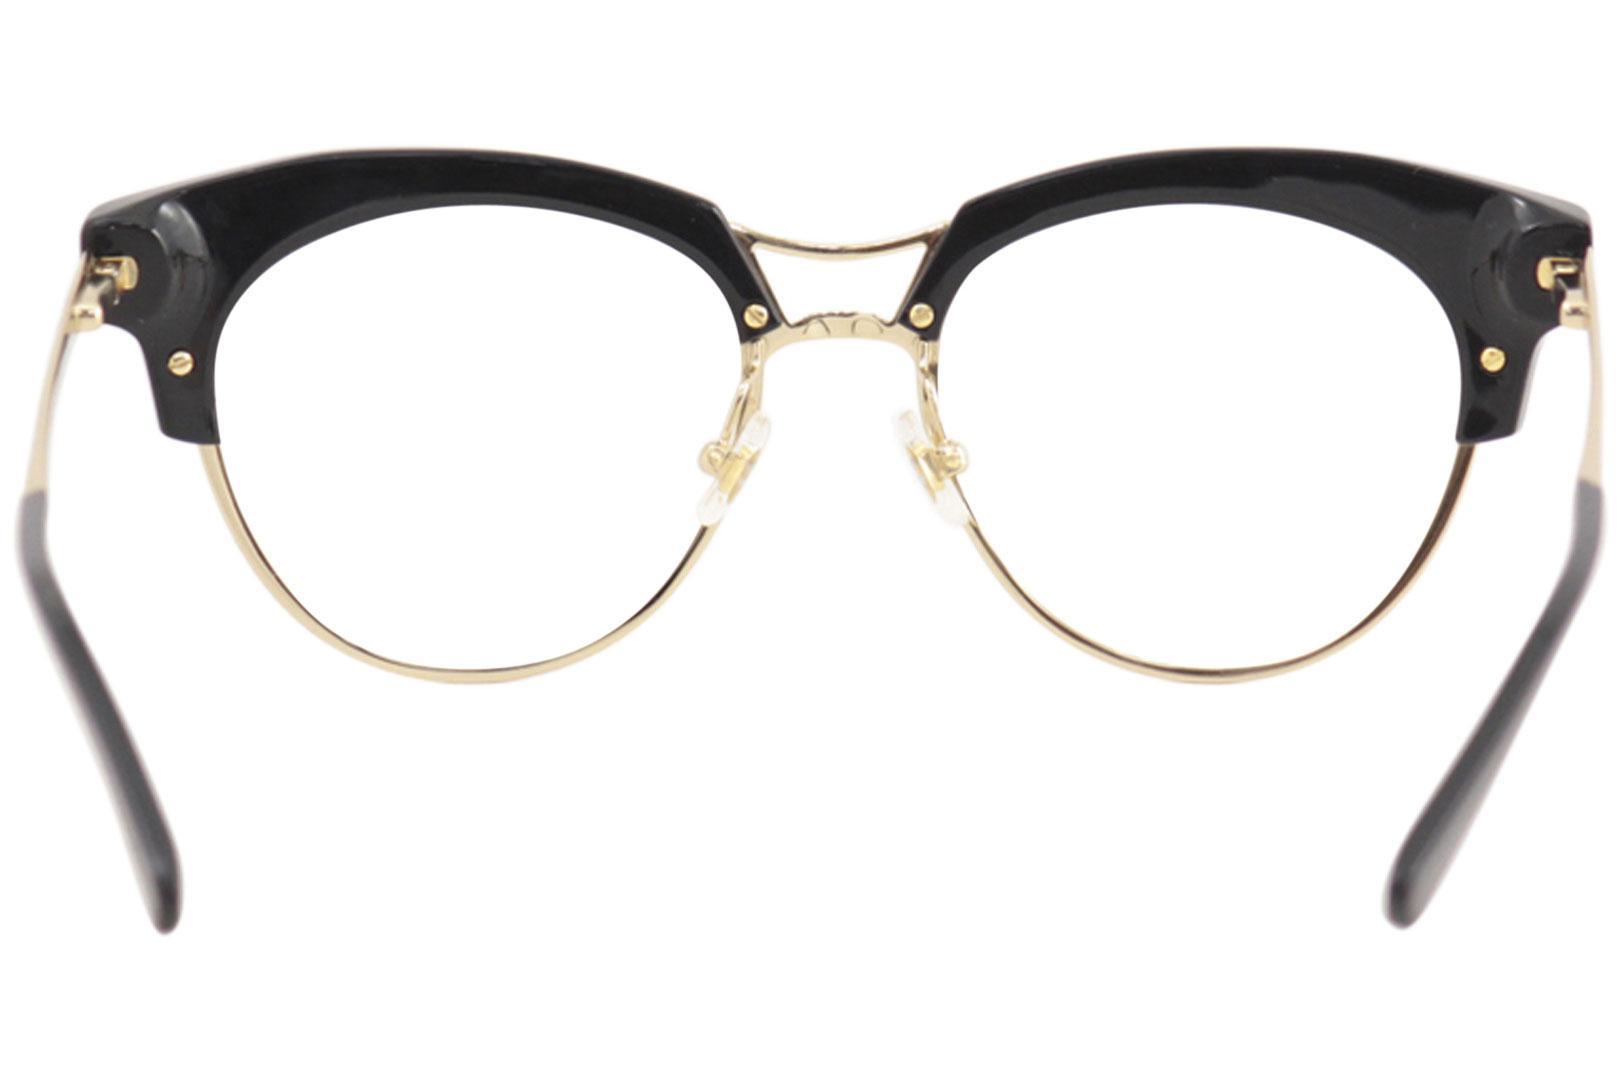 f4845786345 MCM Women s Eyeglasses MCM2106 MCM 2106 Full Rim Optical Frame by MCM. 12345